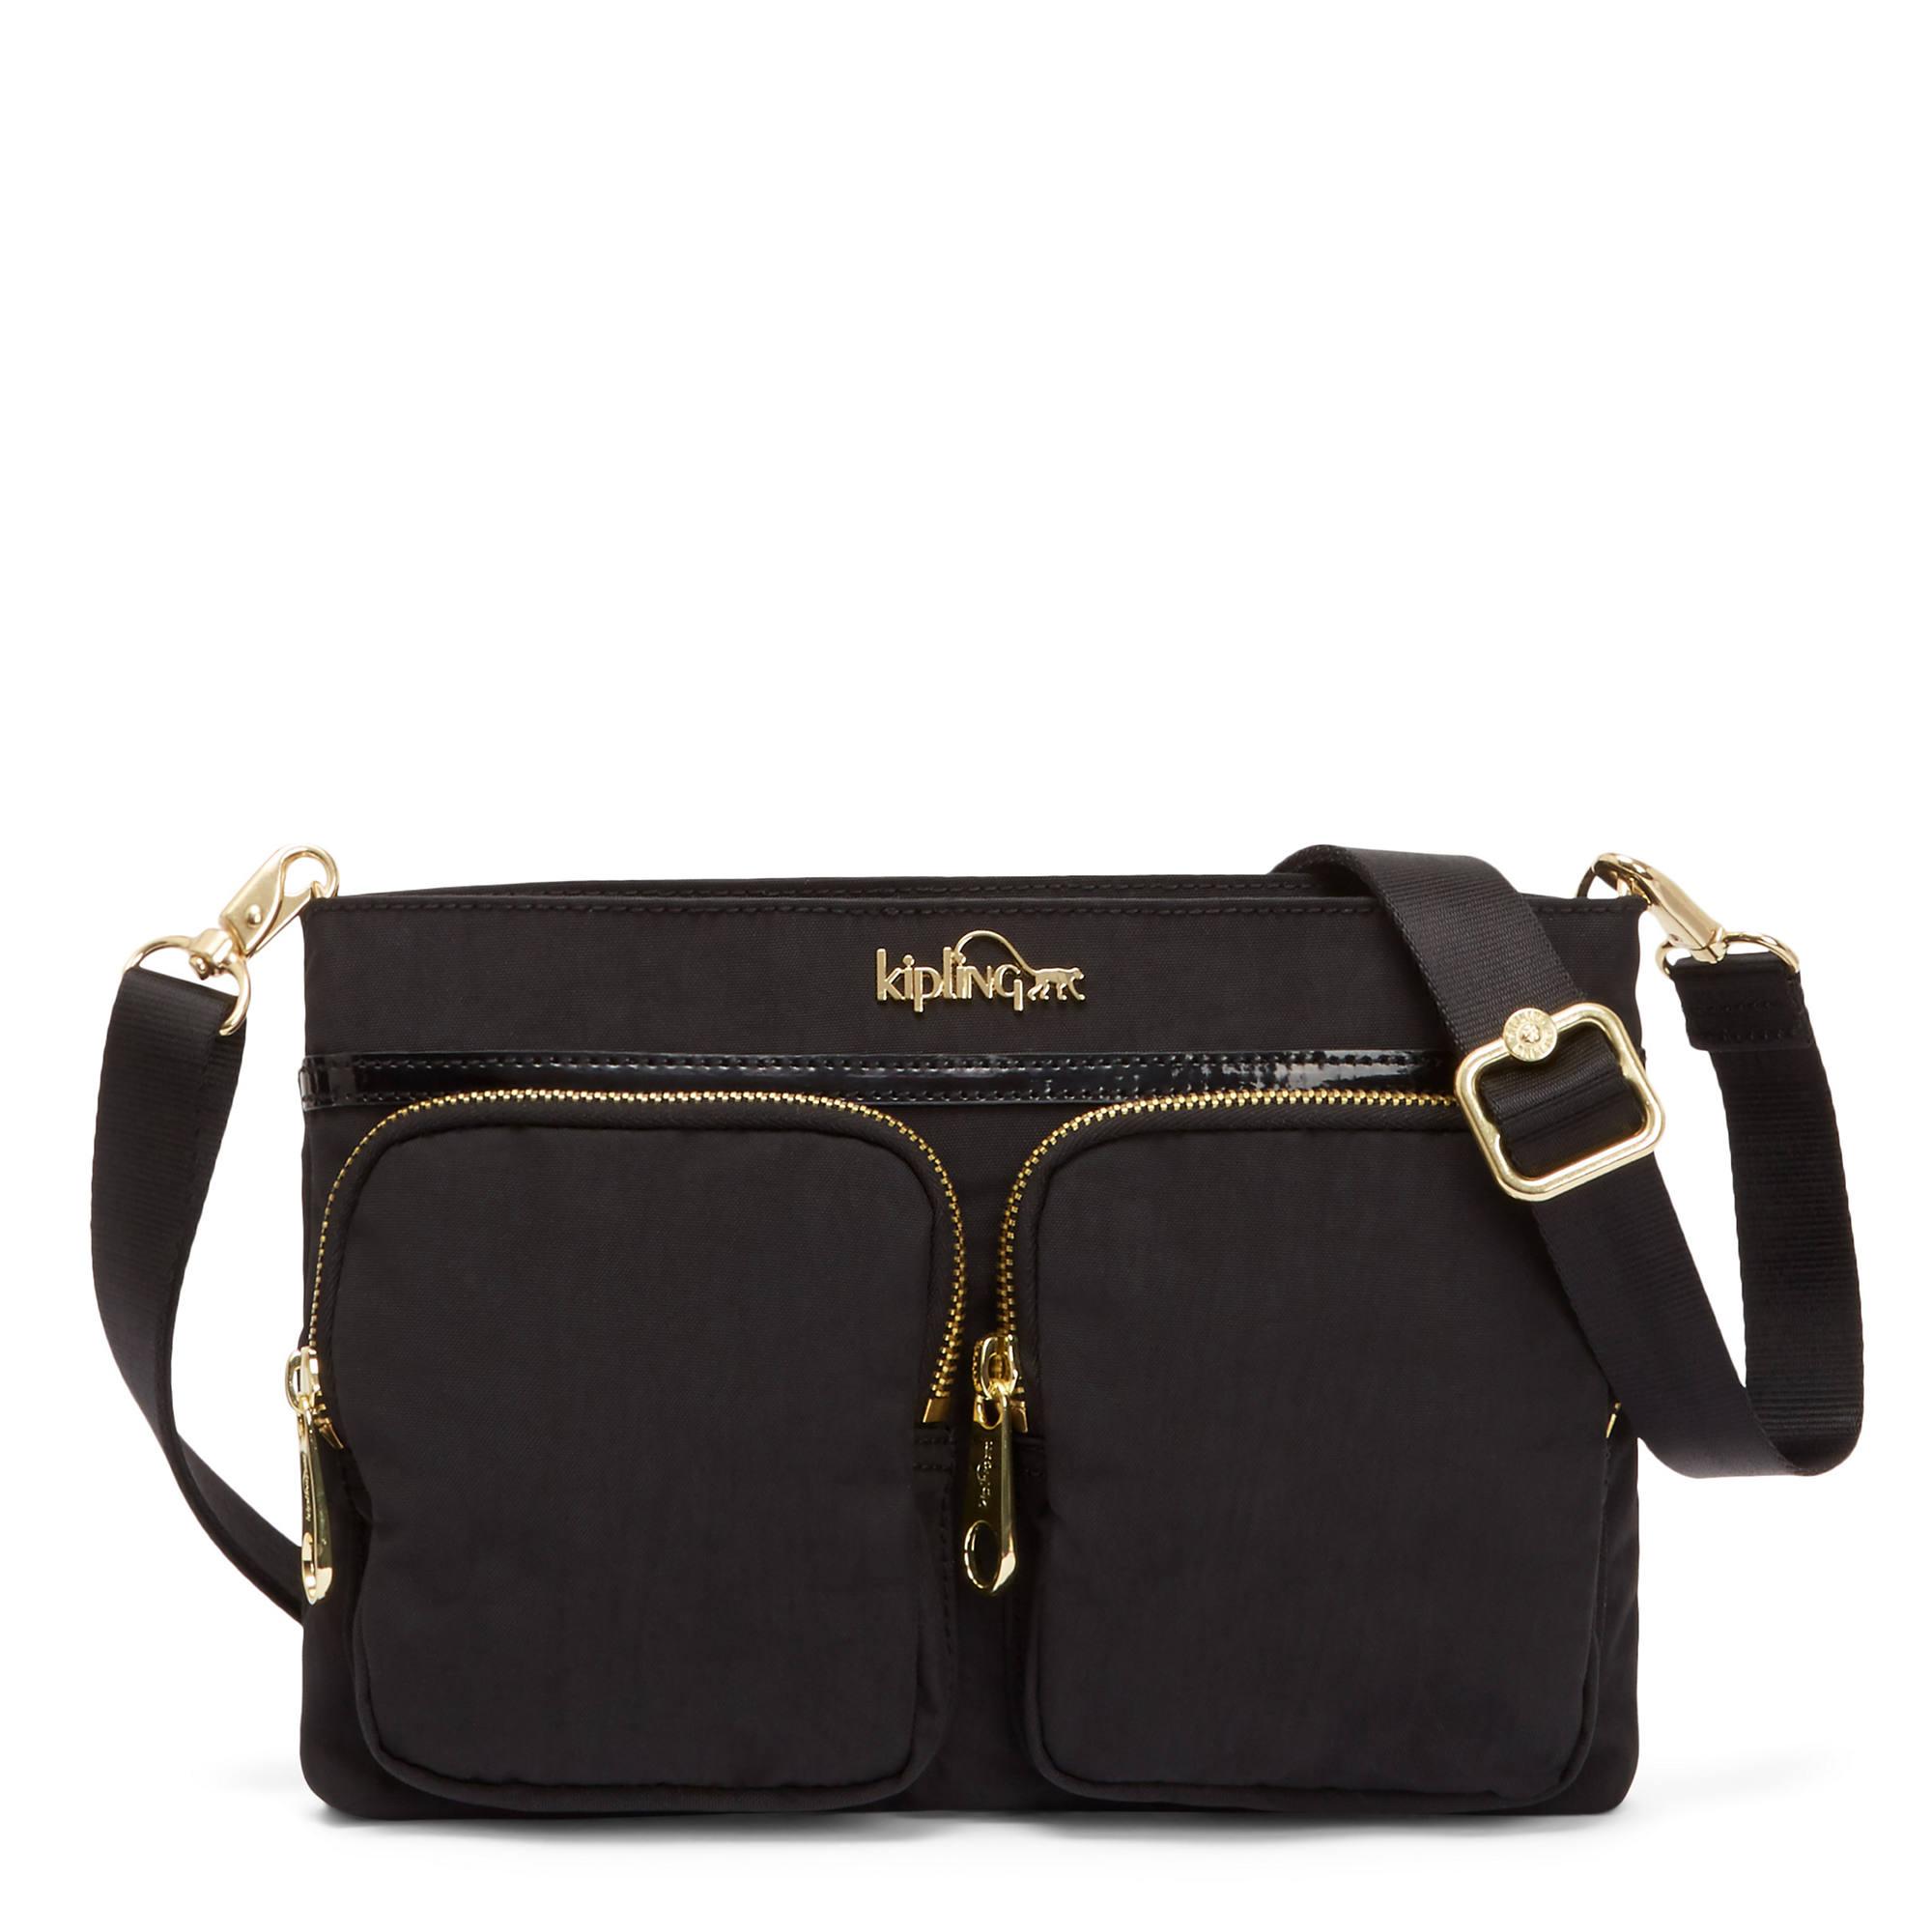 Tessa 5 In 1 Convertible Handbag Black Patent Combo Large